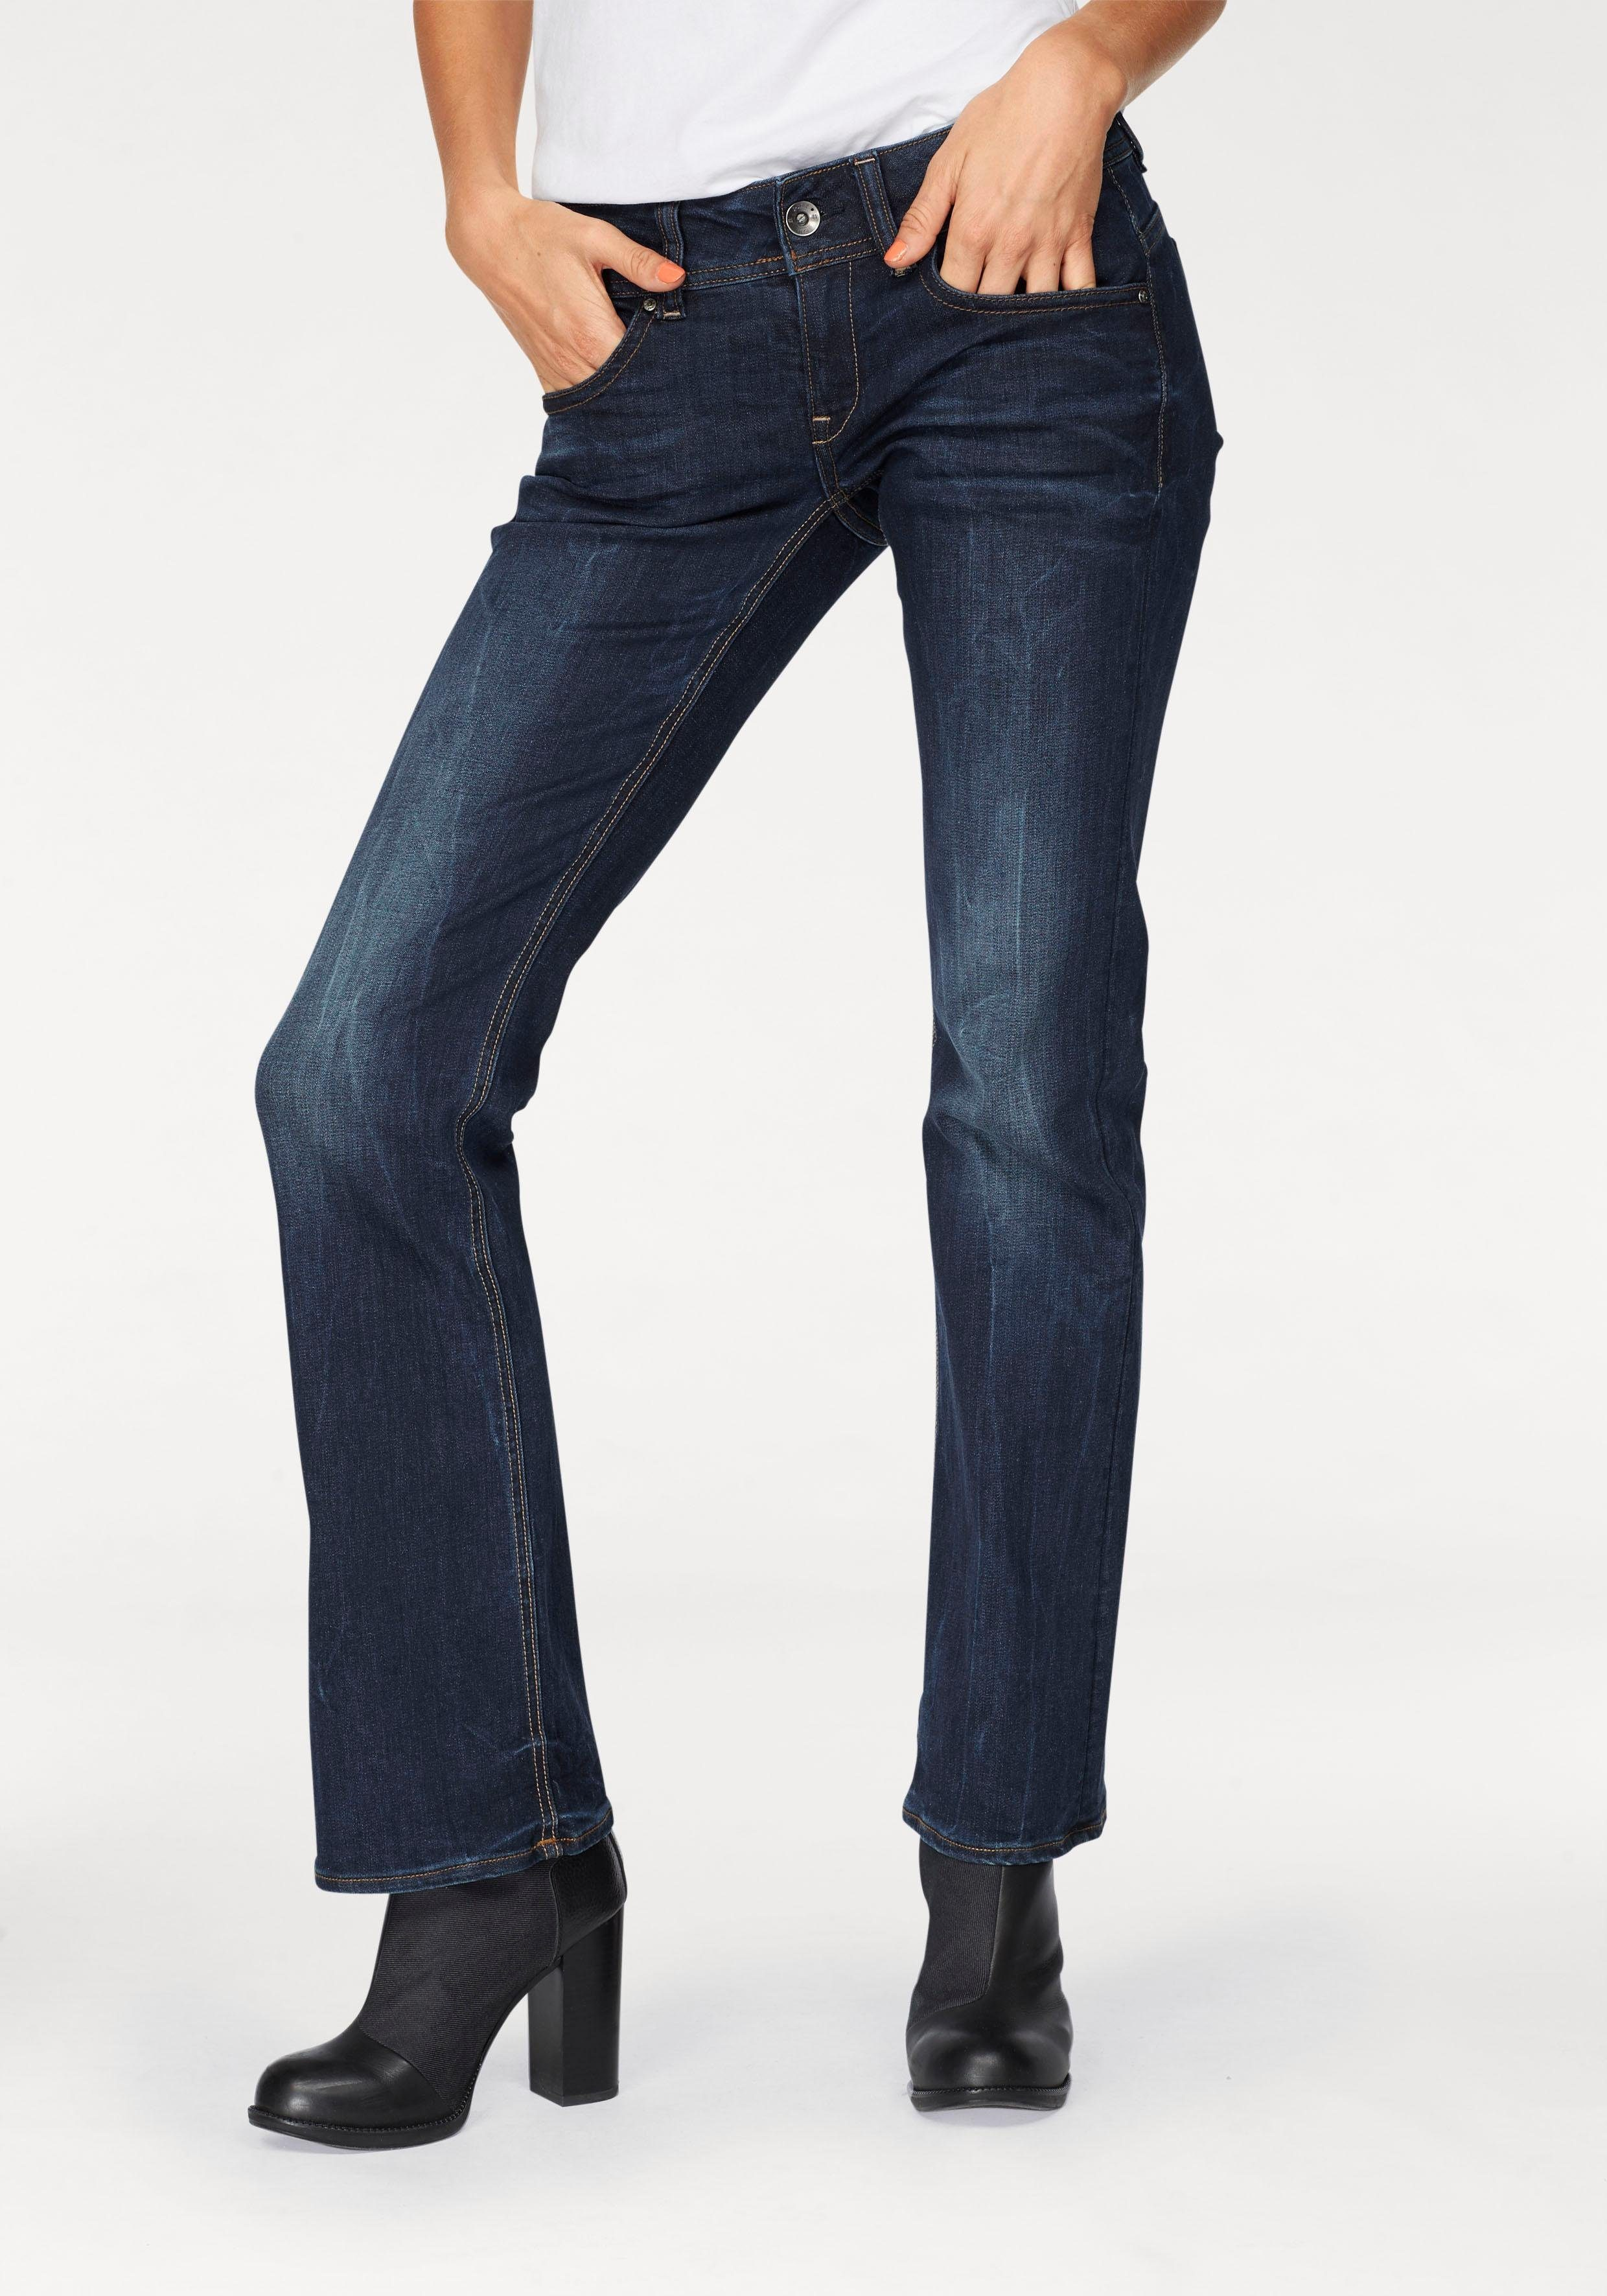 g-star damen bootcut jeans midge bootleg